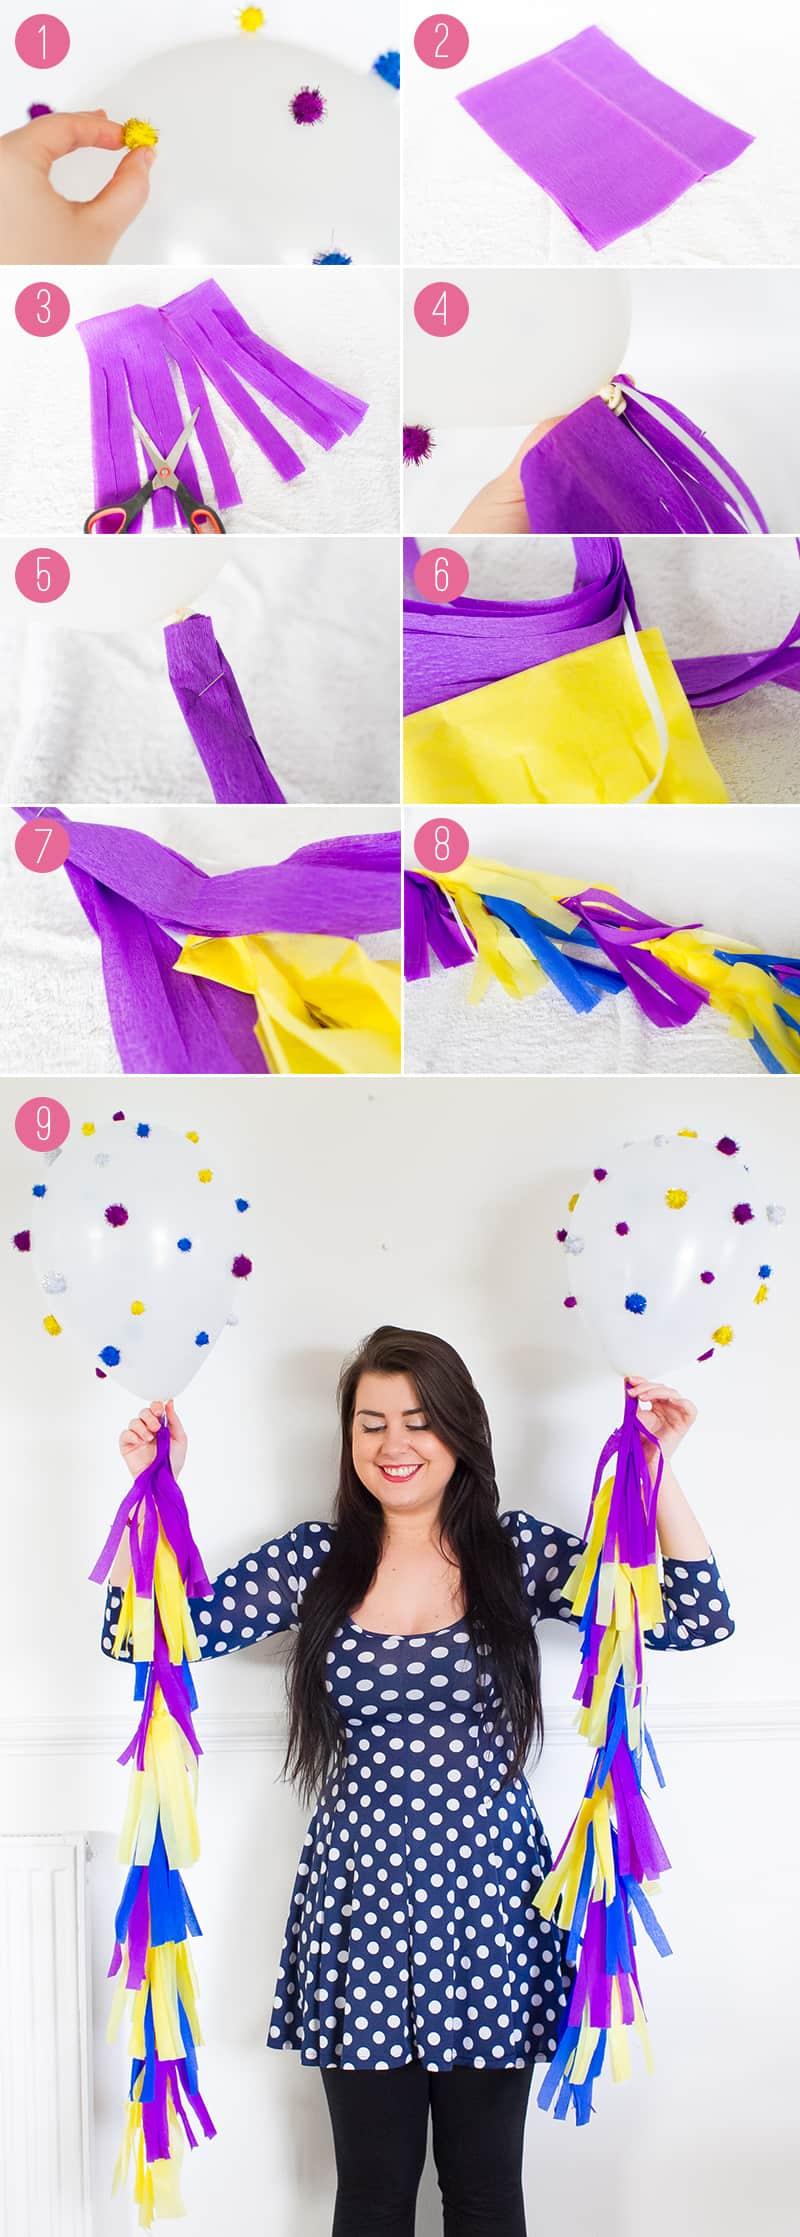 DIY Pom Pom Balloons with Tassels 2